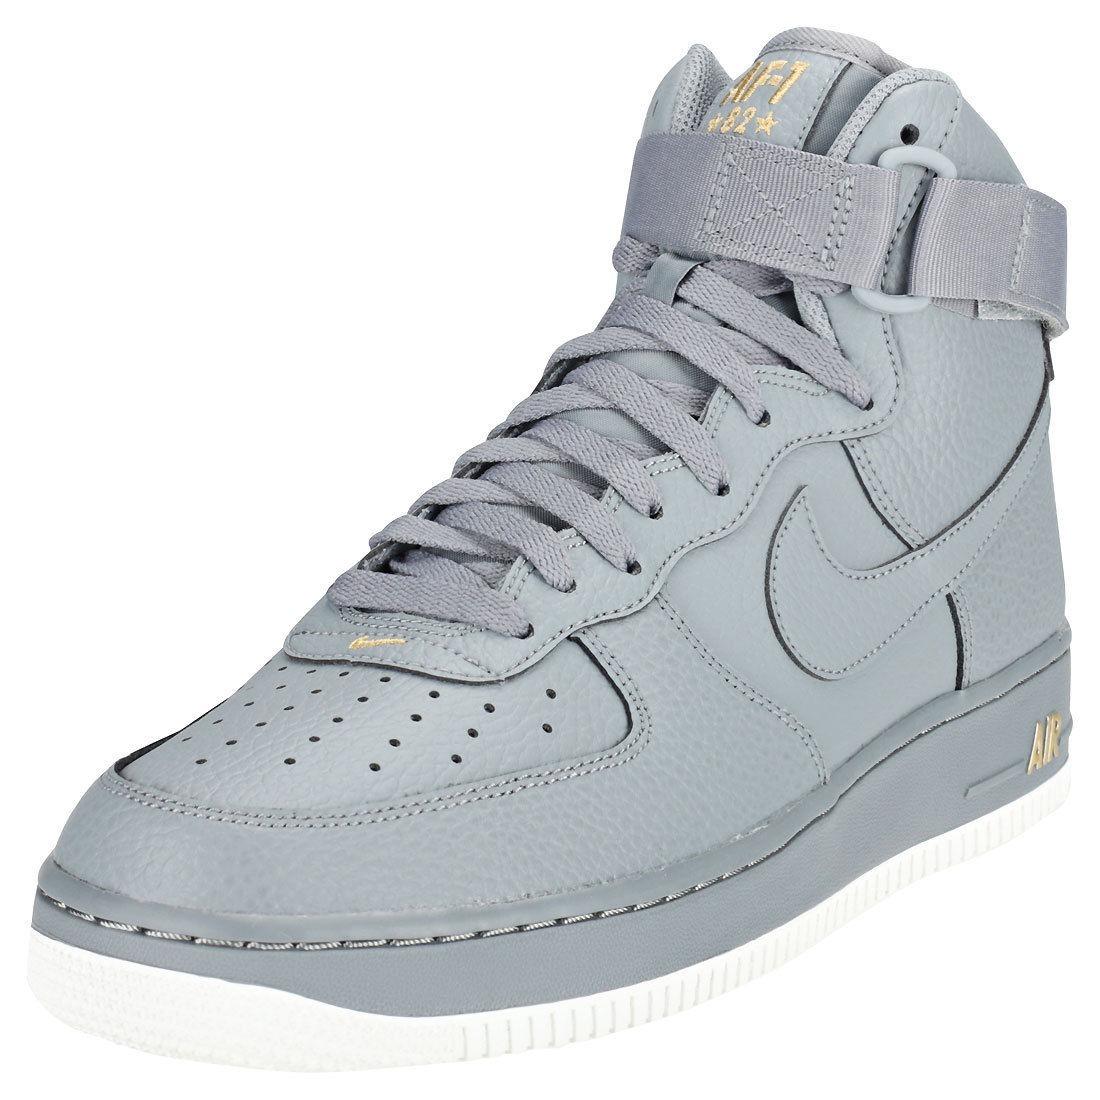 dadc9547 Nike Air Force 1 High 07 Casual Bota Hombre Original - $ 2,399.00 en ...